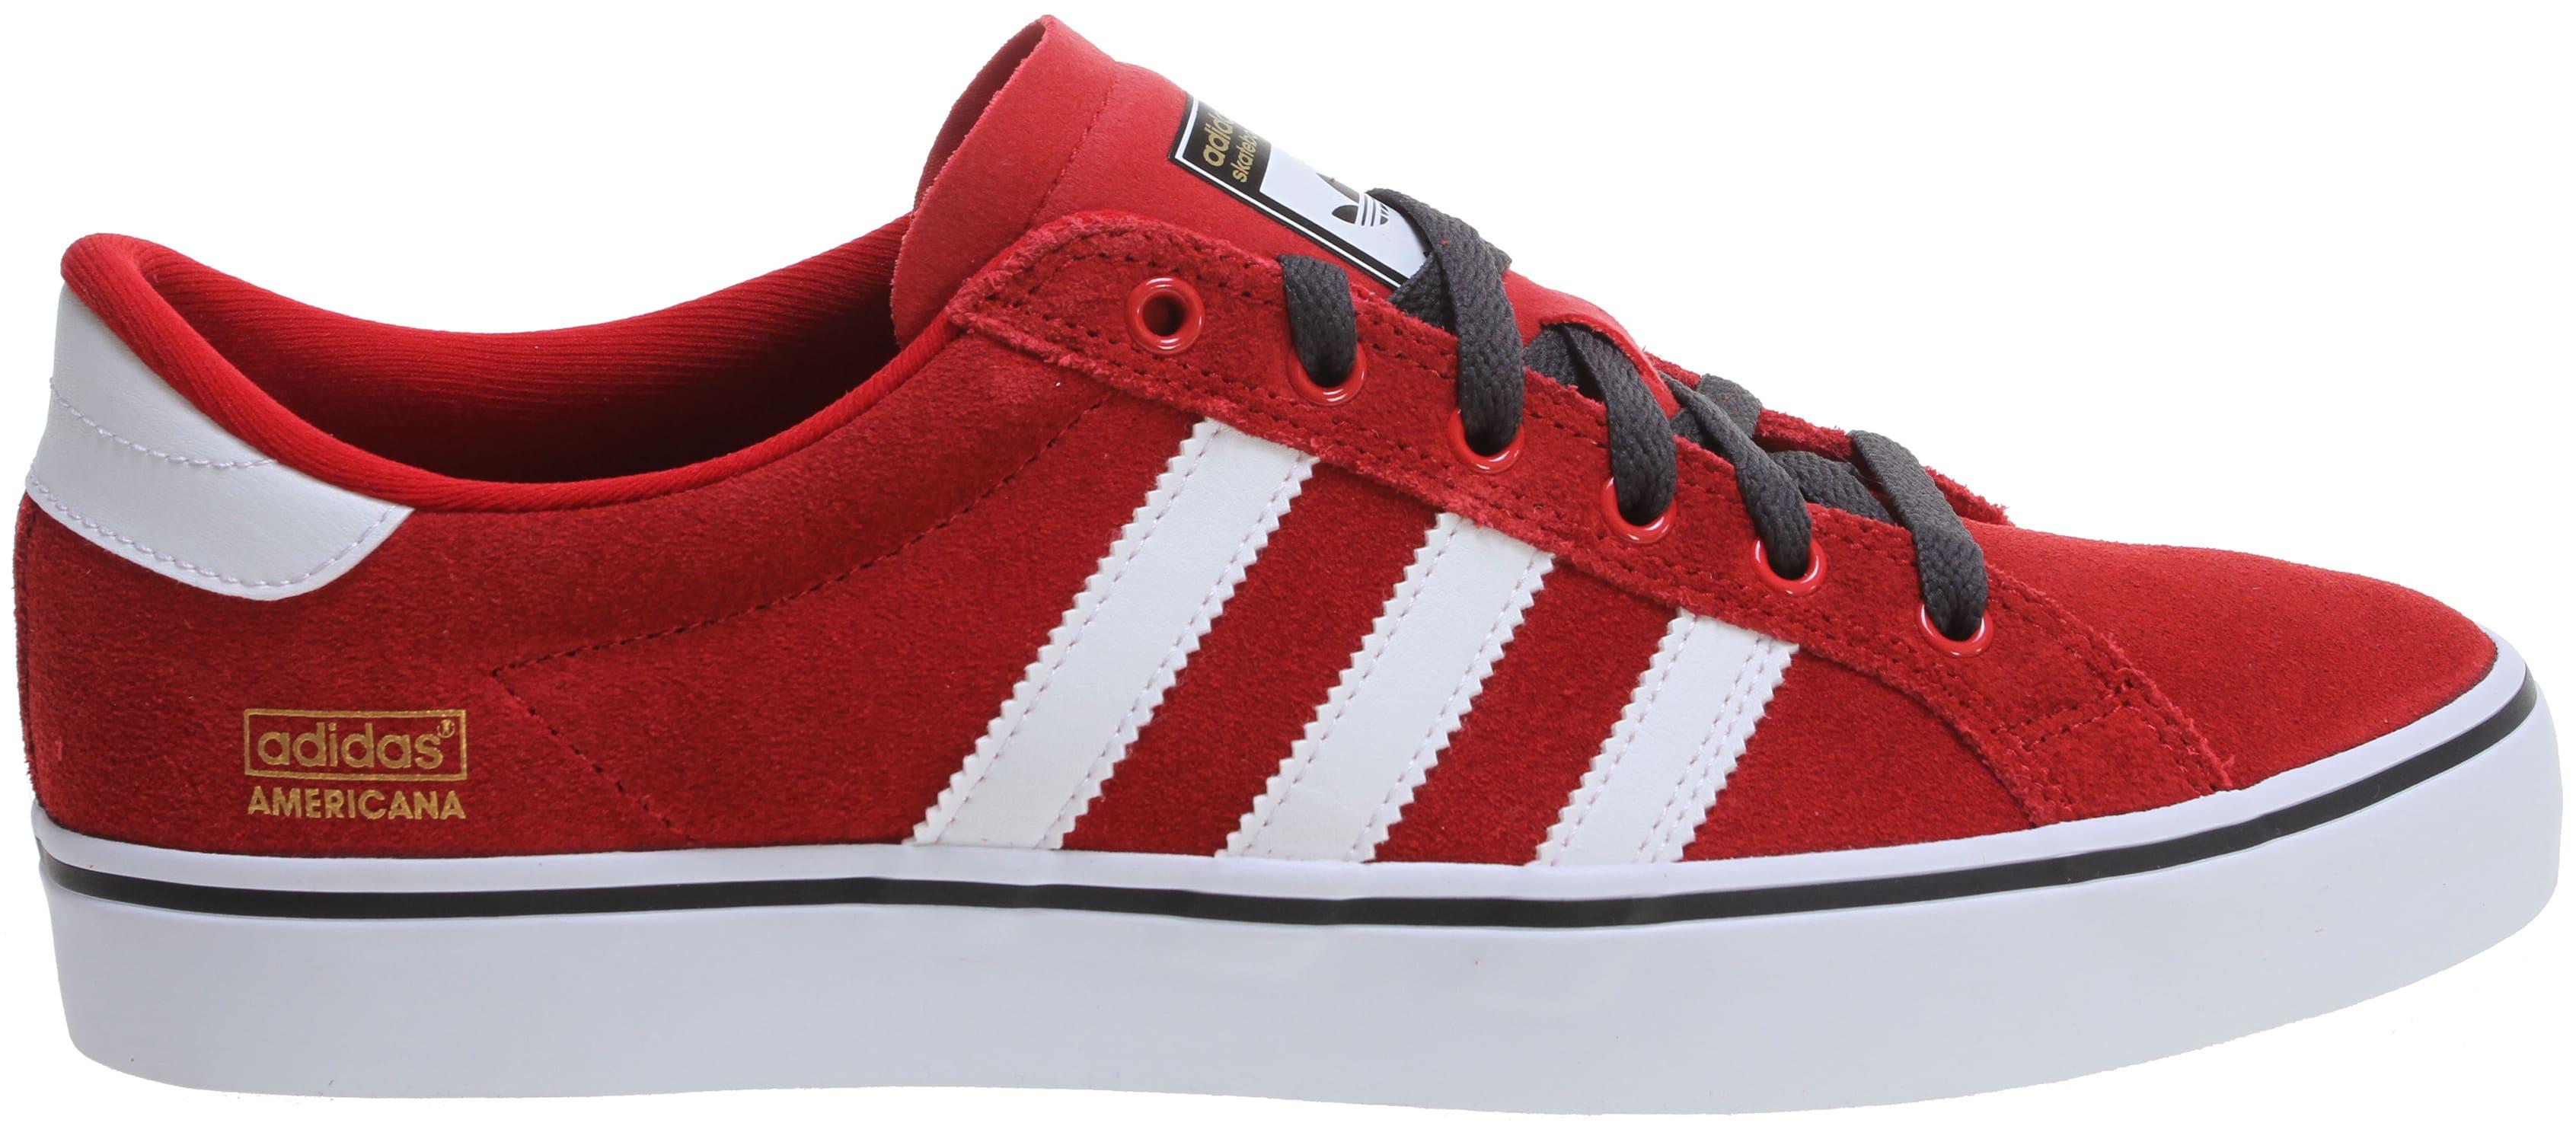 Adidas Americana Low Skate Shoes - thumbnail 1 dca4a0cf7429